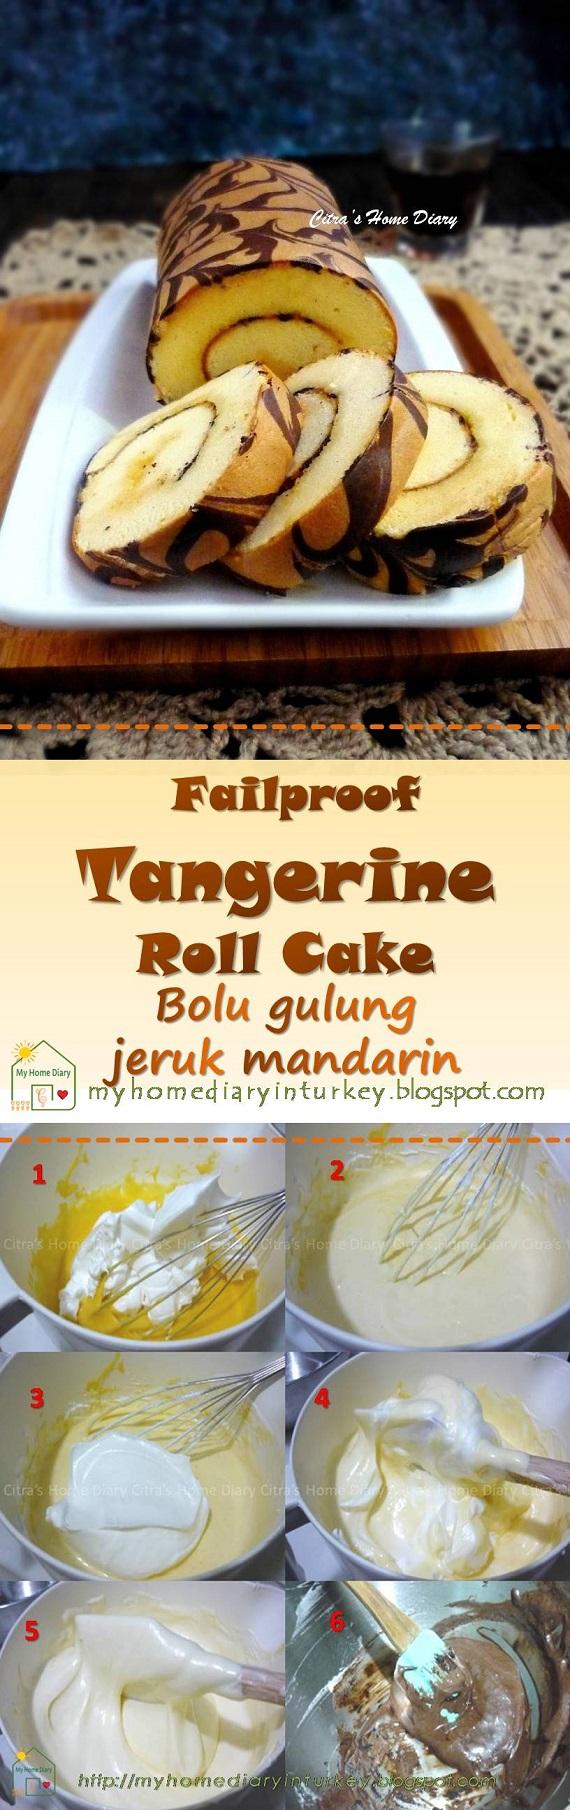 Tangerine orange Roll Cake, easy and failproof / Bolu gulung jeruk mandarin-Çitra's Home Diary. #mandarinorange #tangerineorange #swissrollcake #baking #bolugulung #bolguljeruk #cake #dessert